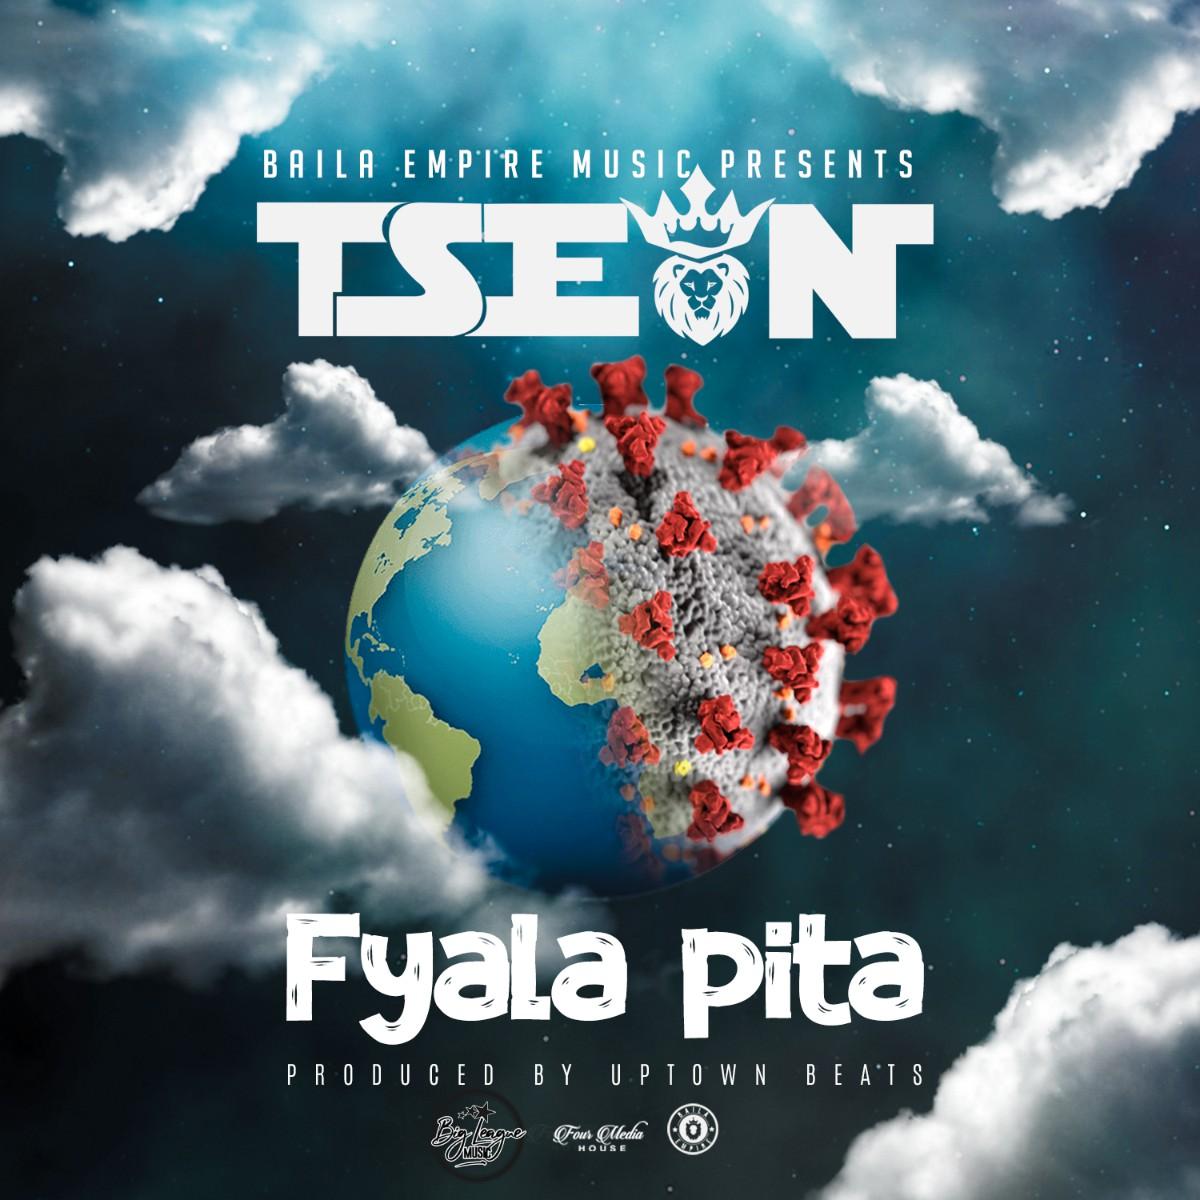 T-Sean - Fyalapita (Prod. Uptown Beats)